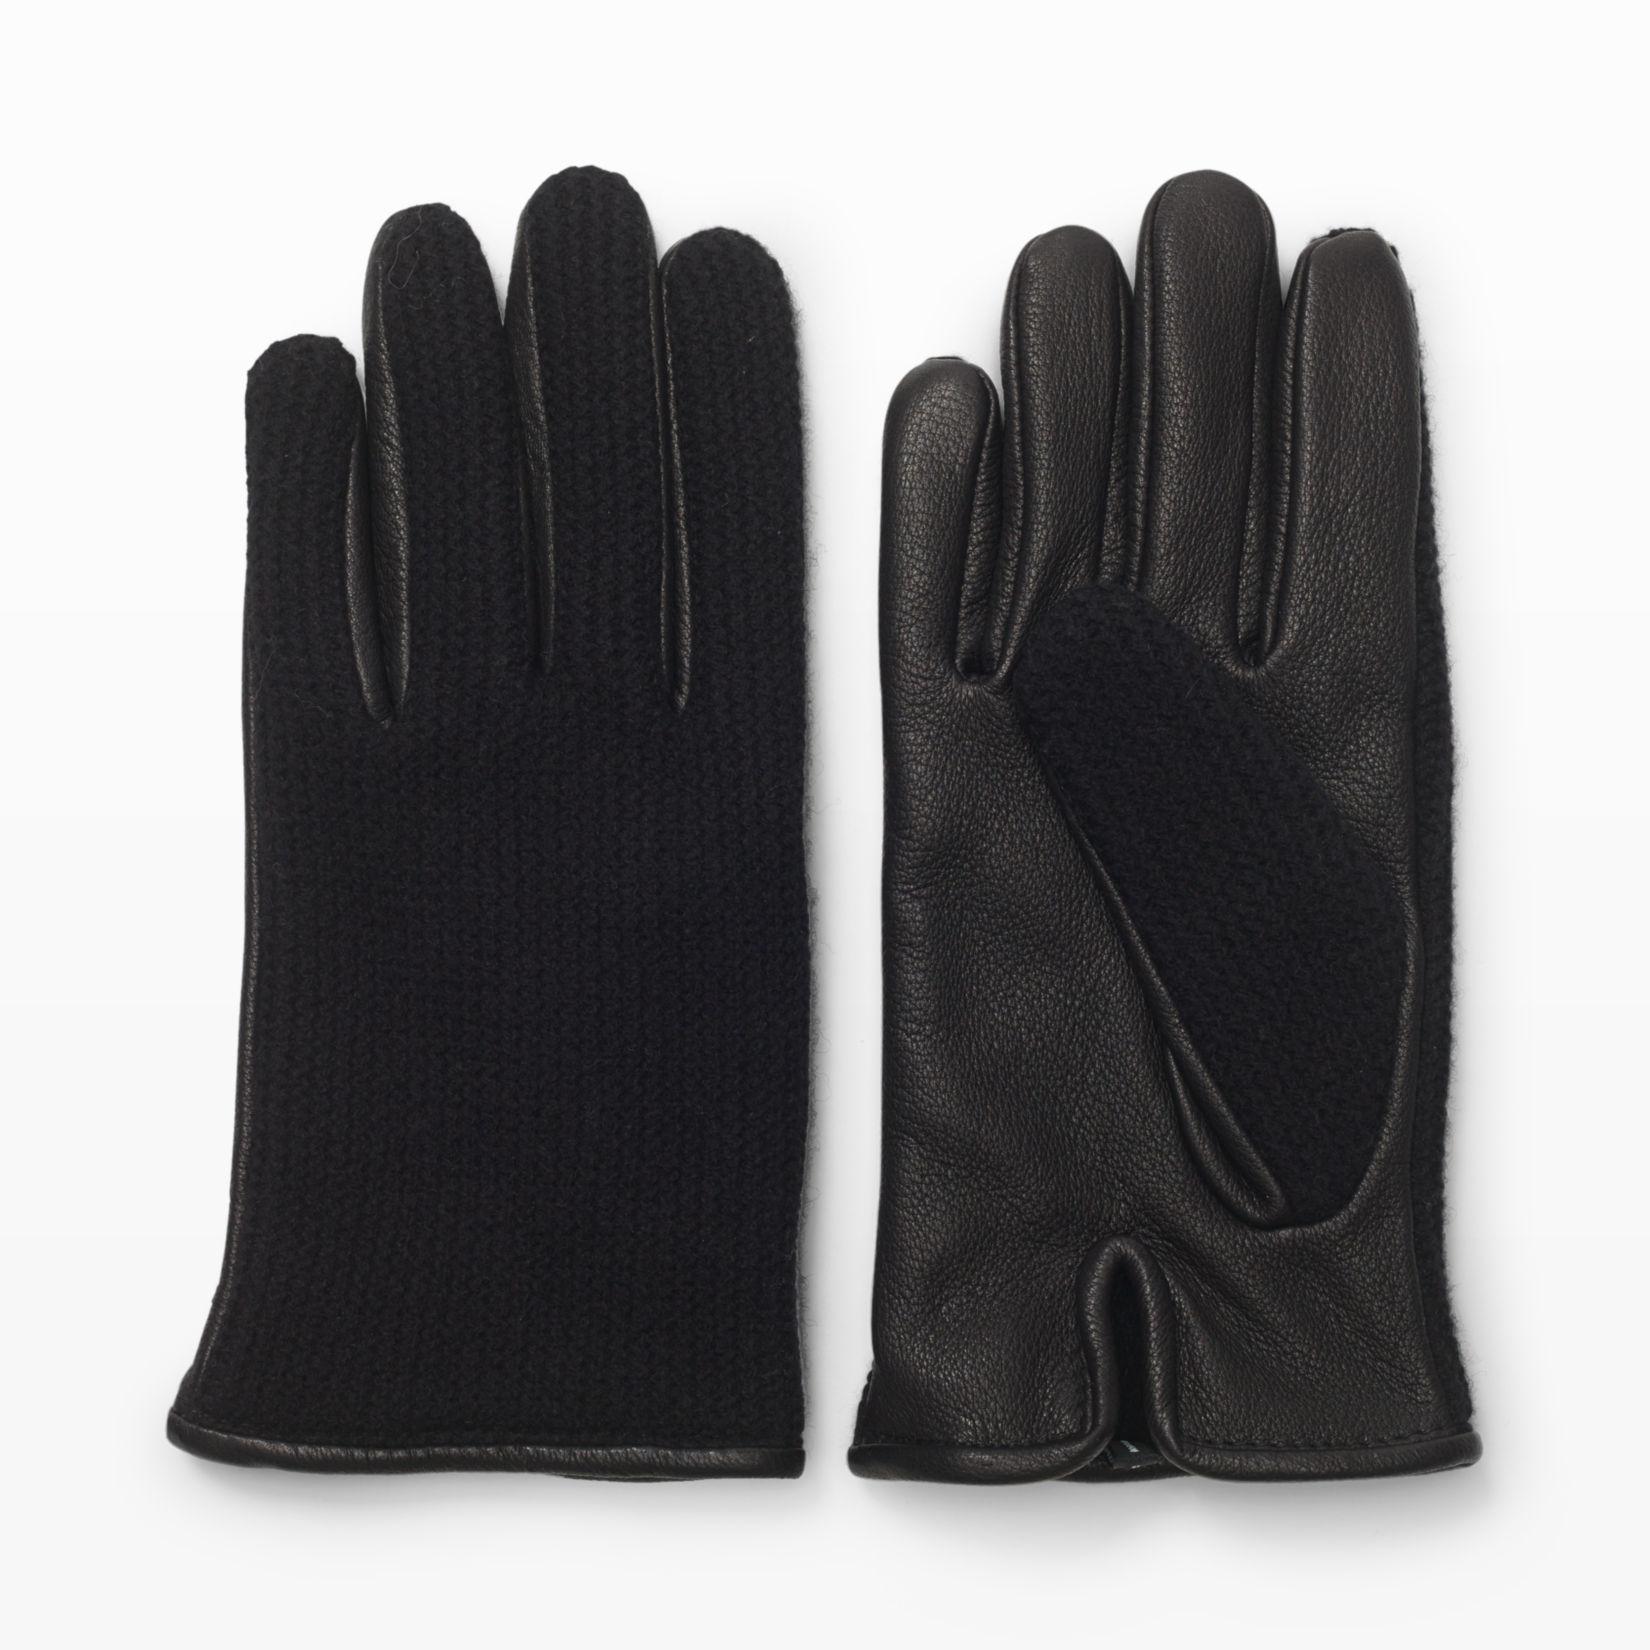 Mens leather gloves xl - Mens Leather Gloves Xl 43